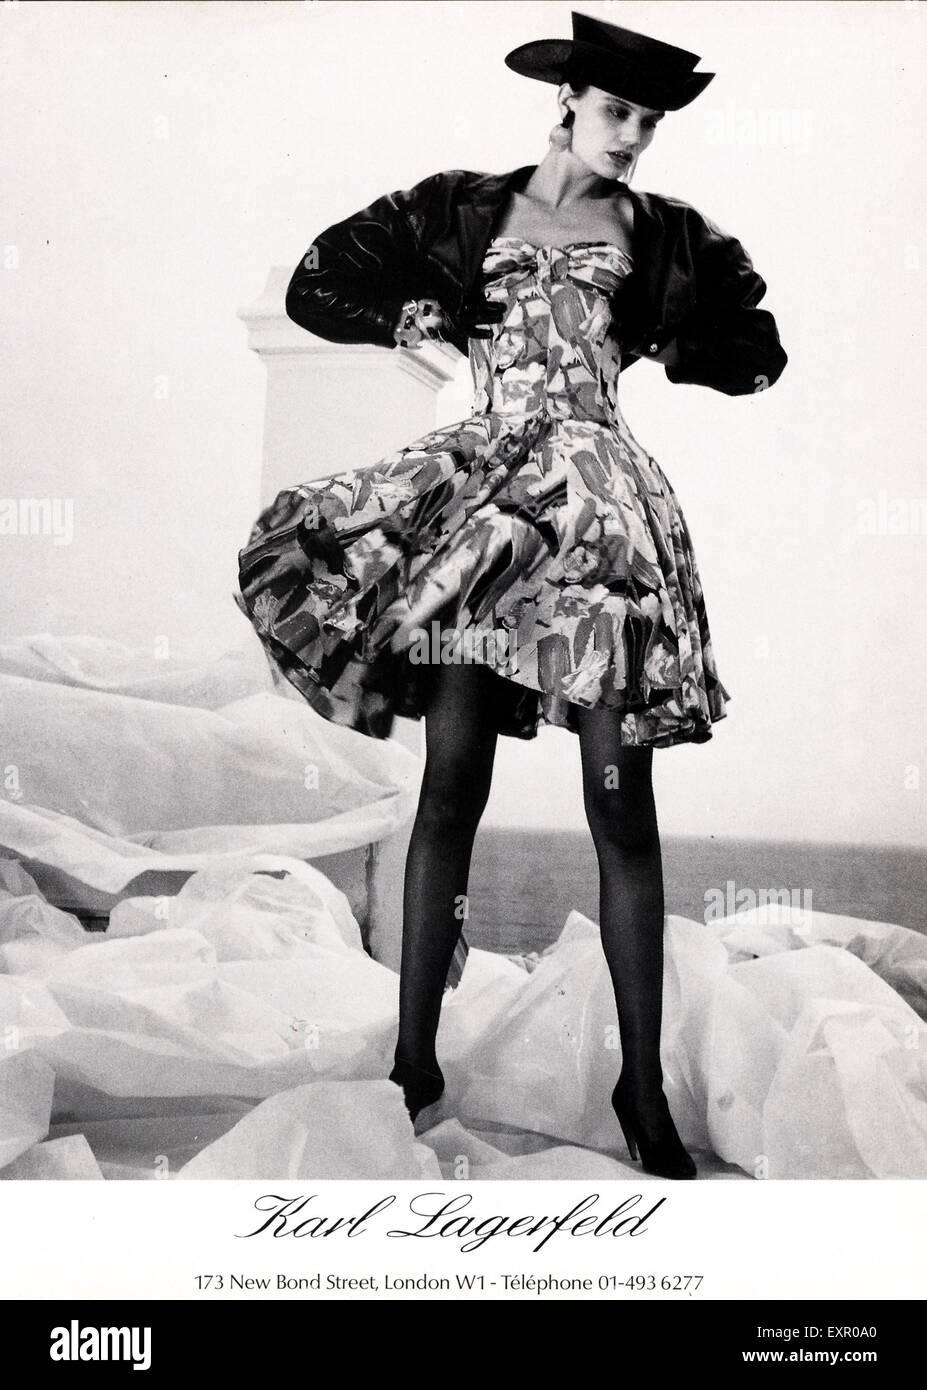 1980s UK Karl Lagerfeld Magazine Advert - Stock Image